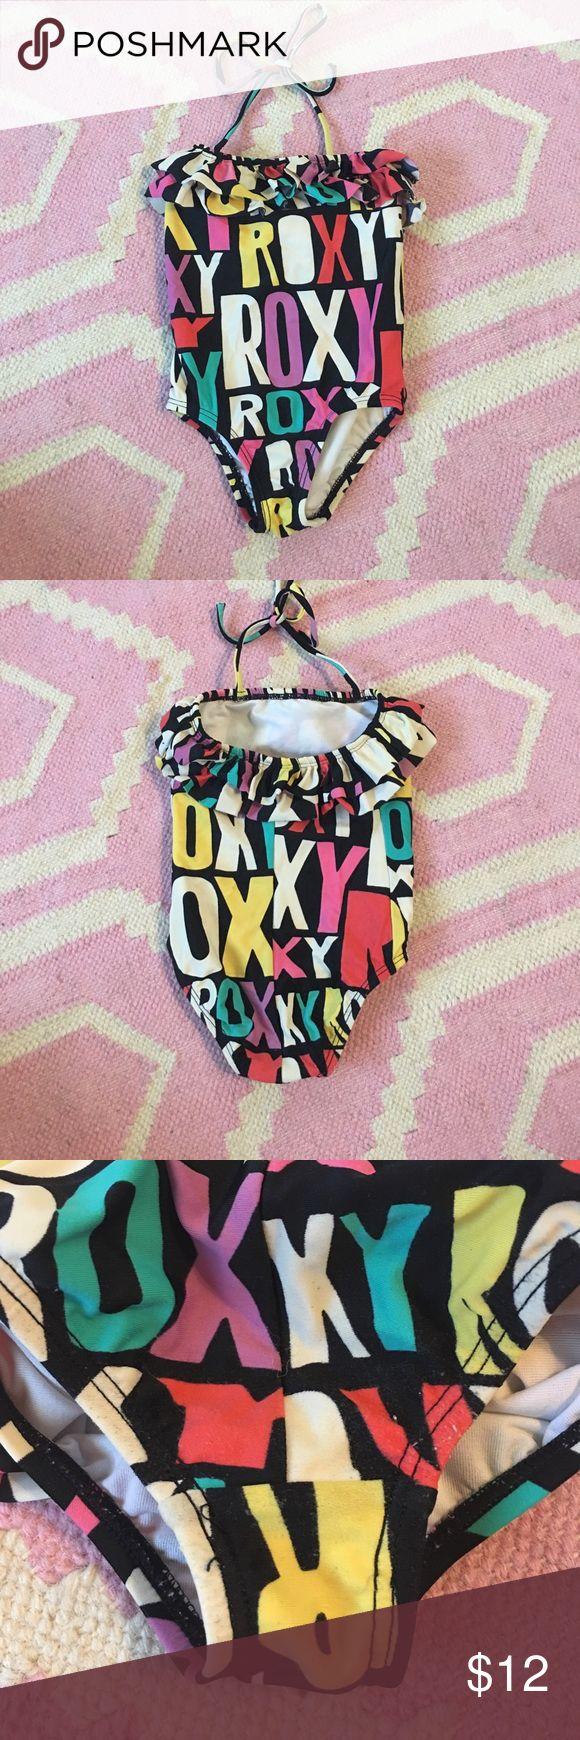 Roxy Teenie Wahine One piece Swimsuit - 2T Roxy Teenie Wahine One piece Swimsuit - 2T - in great used condition. Runs small (more like 12-18 months in my opinion) Roxy Swim One Piece